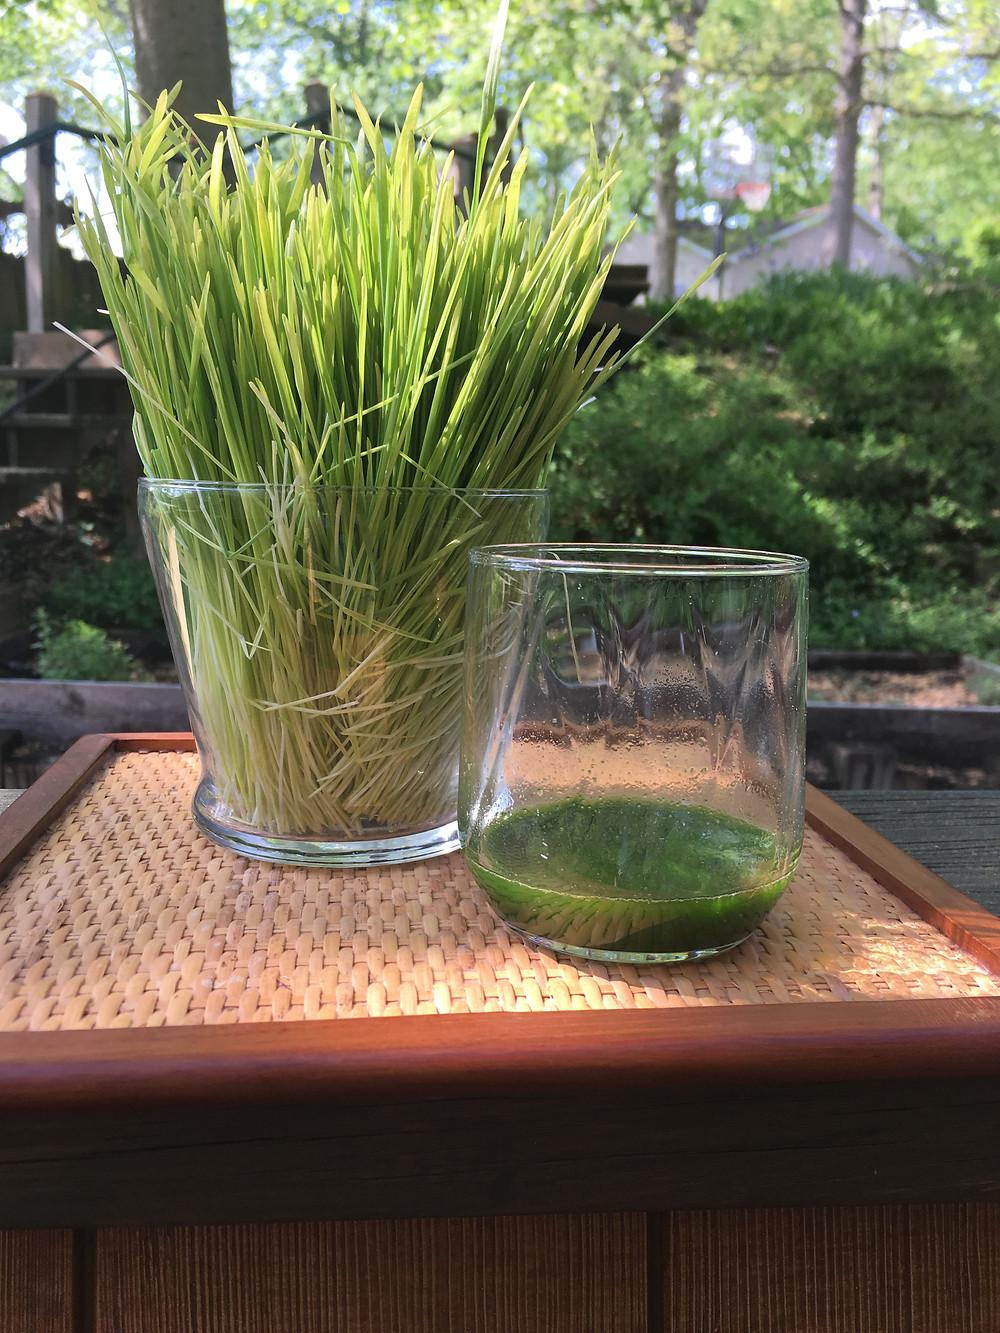 Daily 1 ounce shot of wheatgrass juice